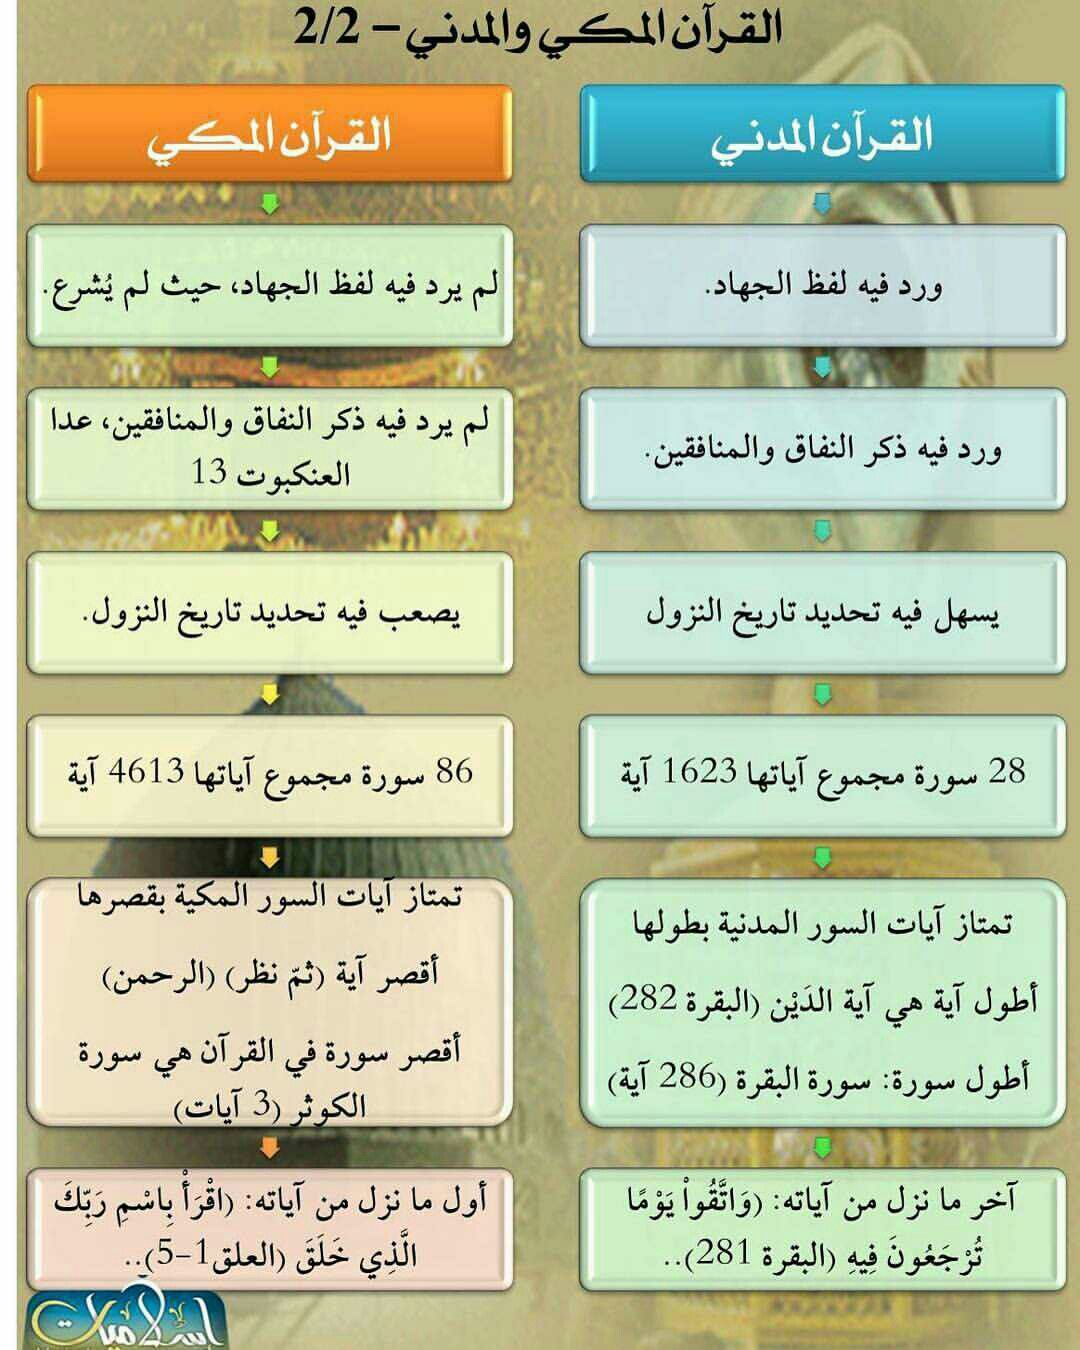 Pin By Zamane On إسلاميات هداية Islam